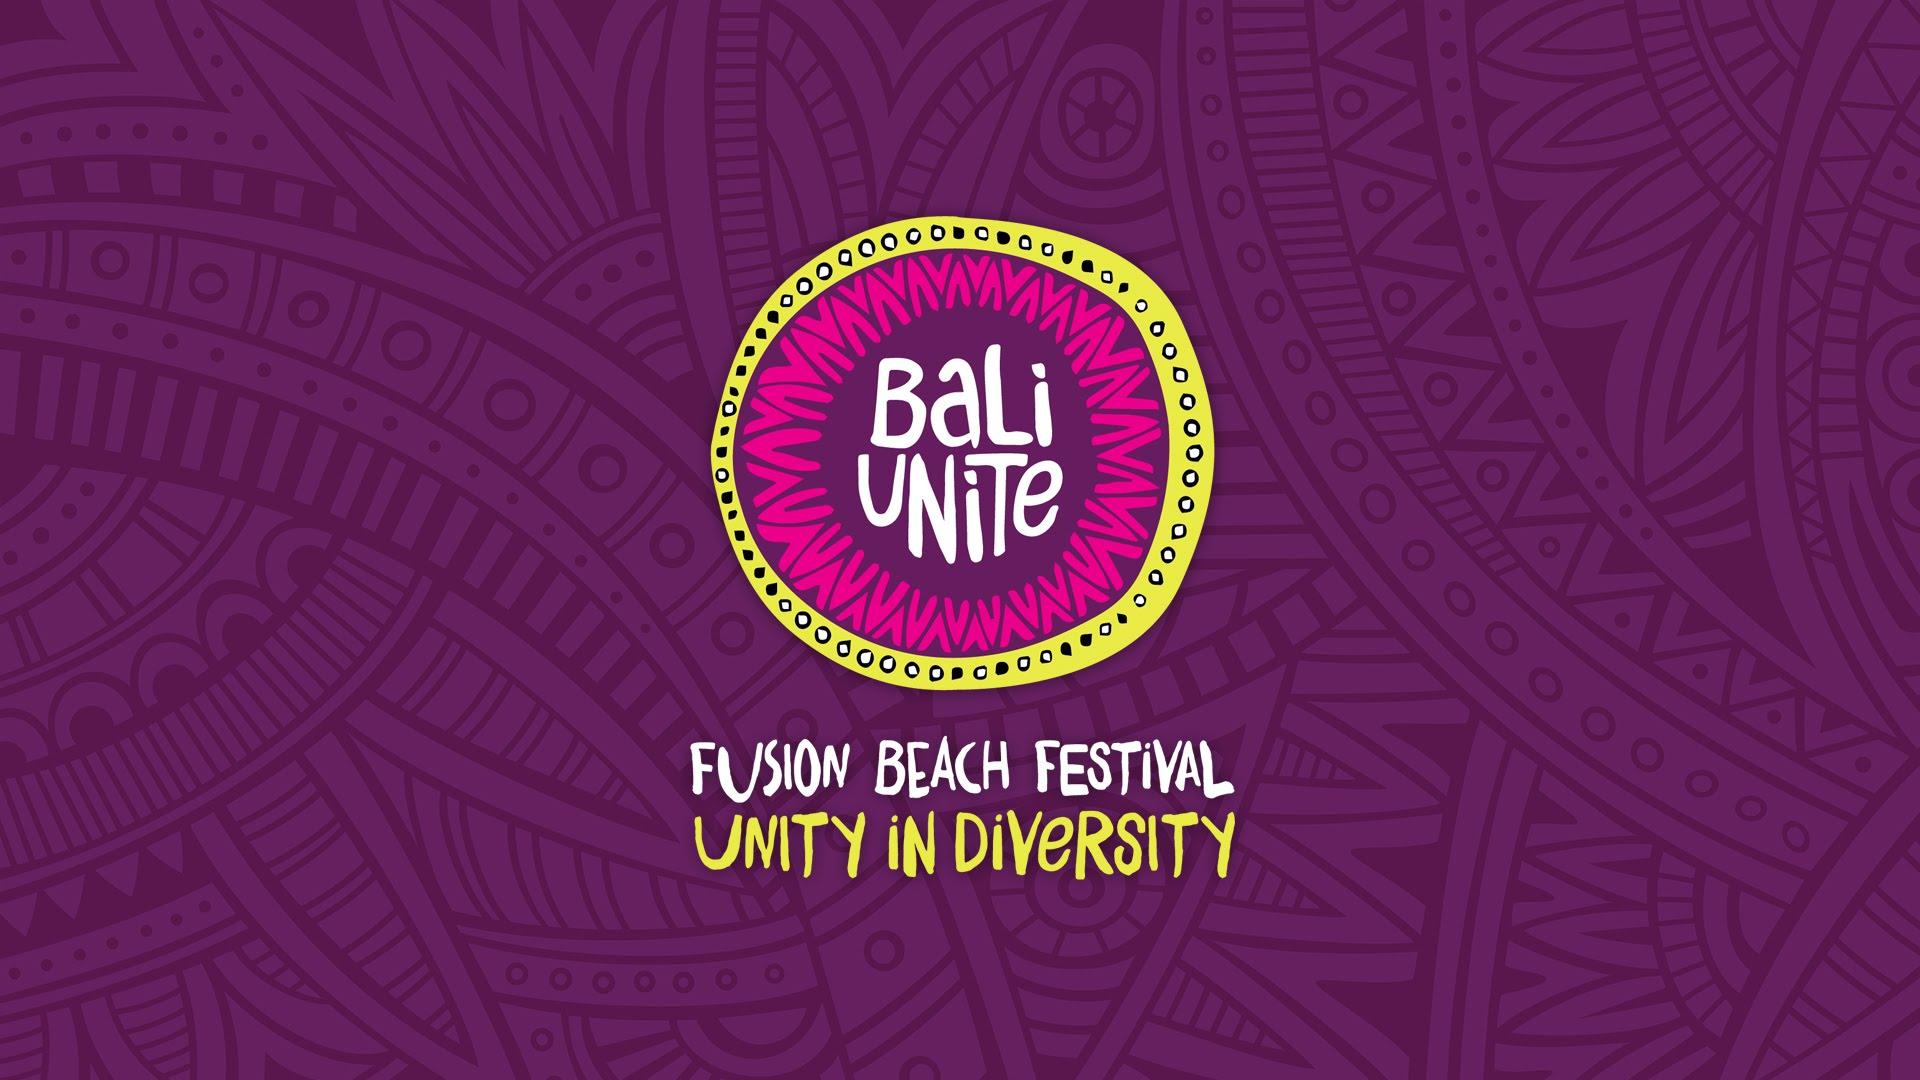 Bali Unite 2015 (Teaser) [11/17/2014]